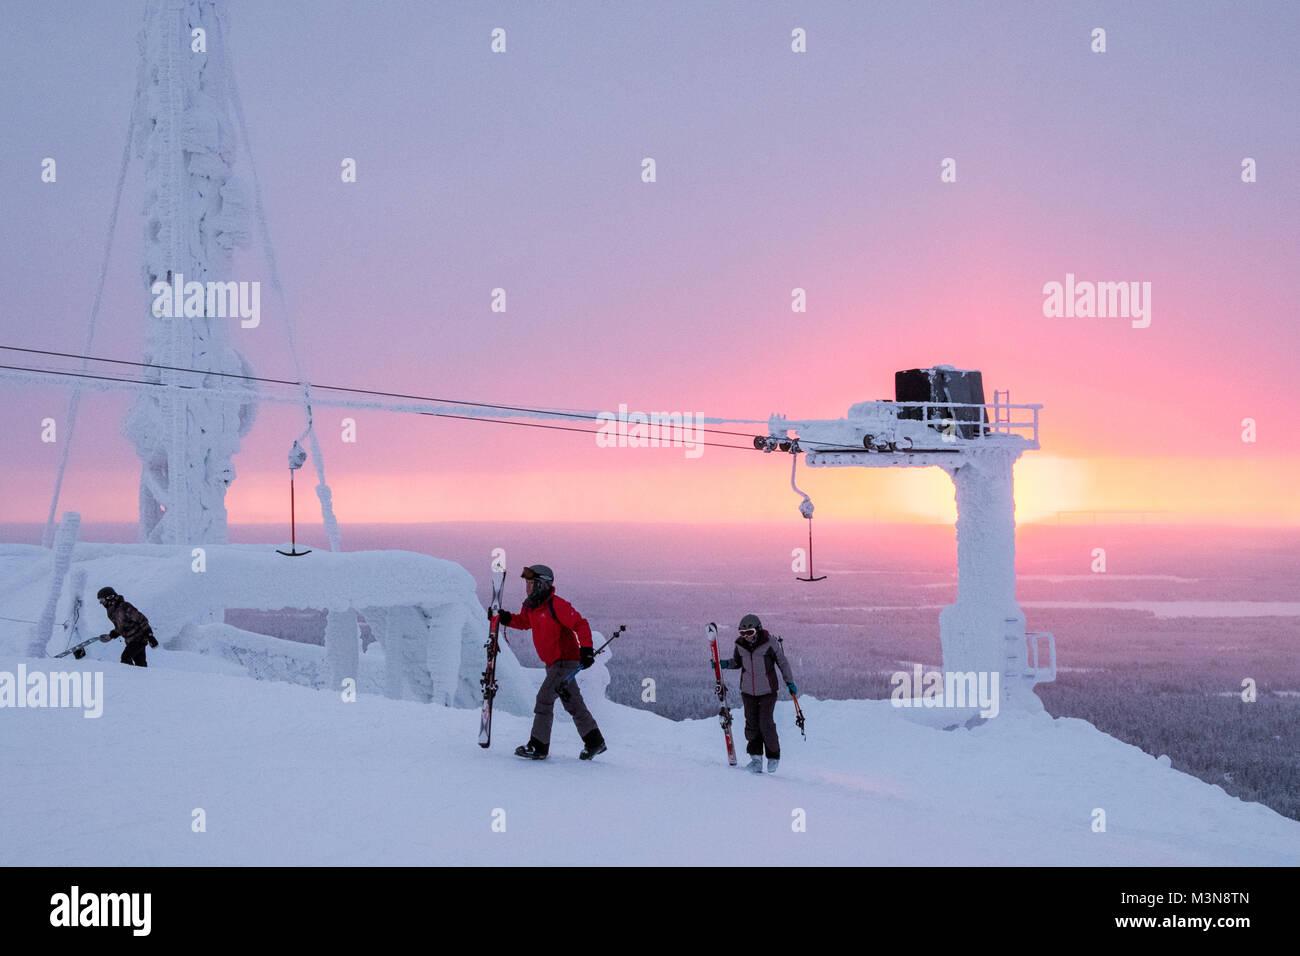 The ski resort of Ruka in Finland - Stock Image